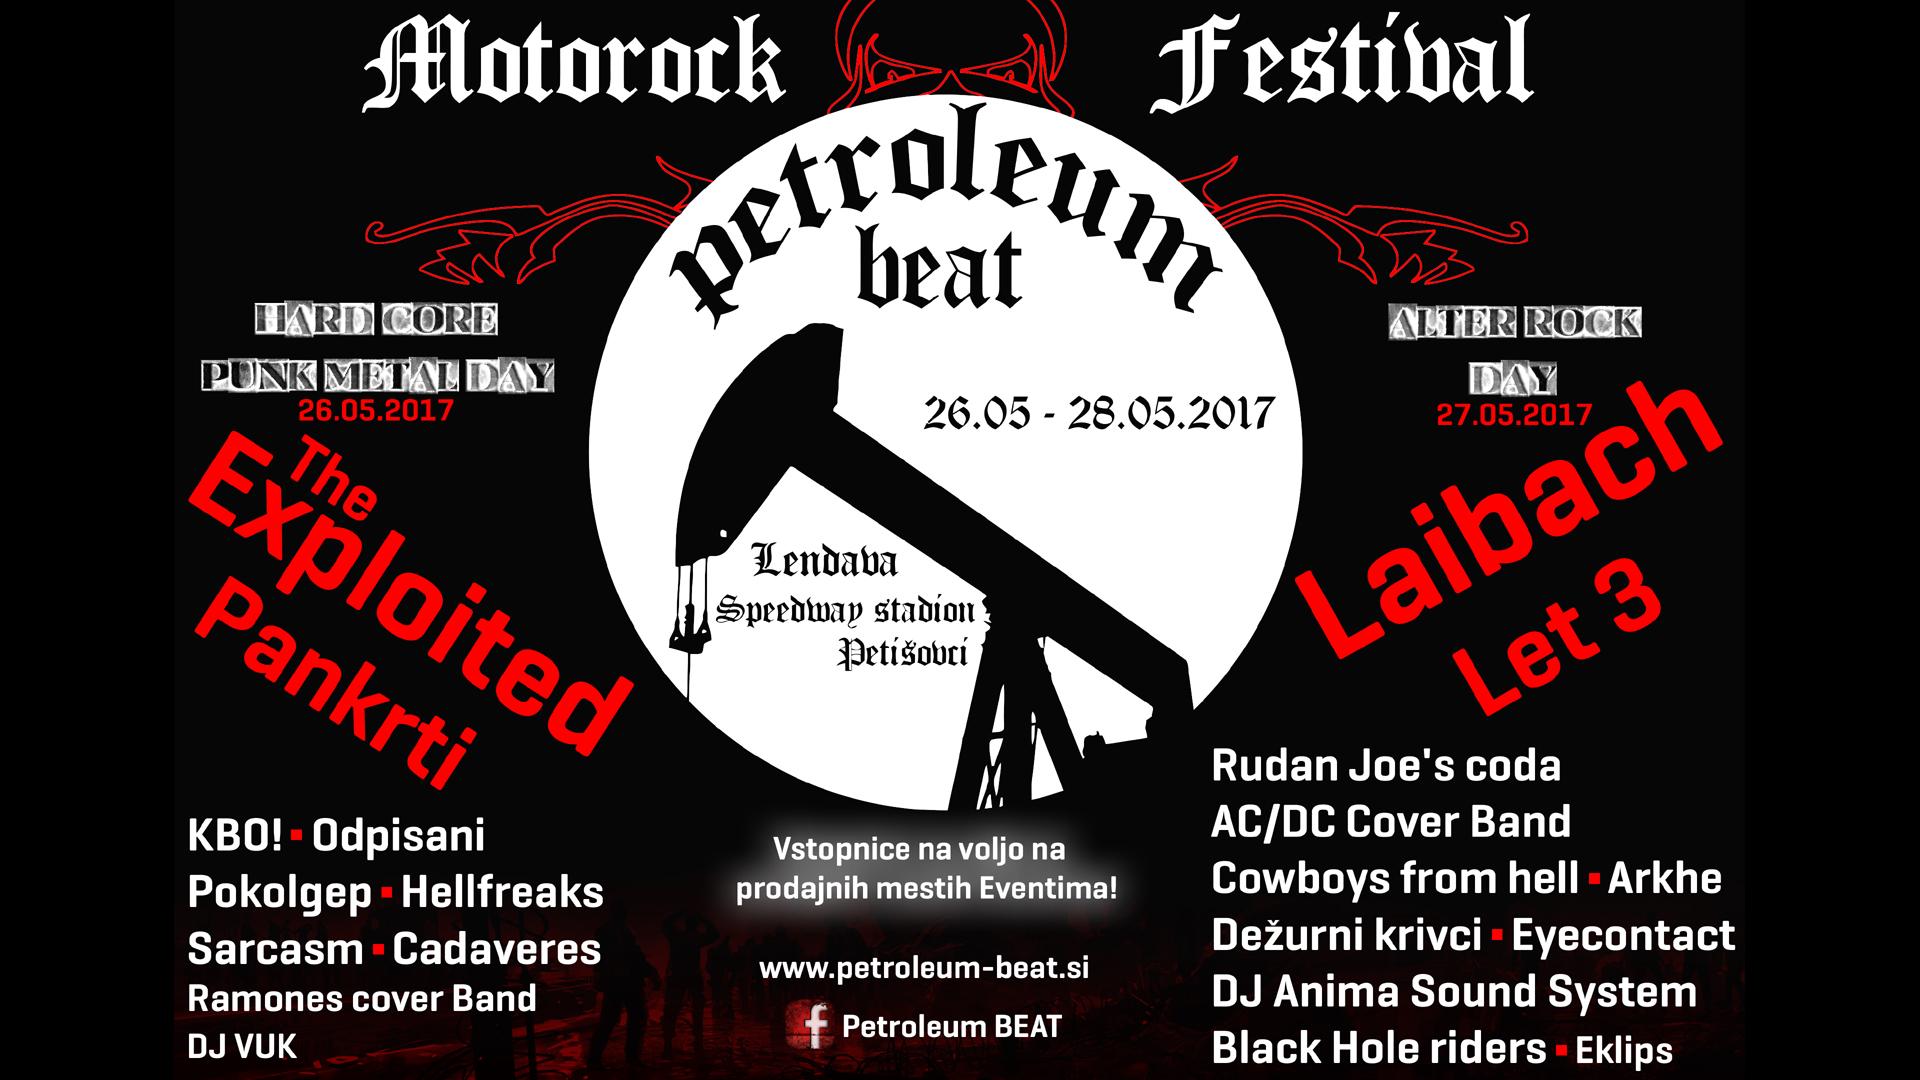 Motorock festival